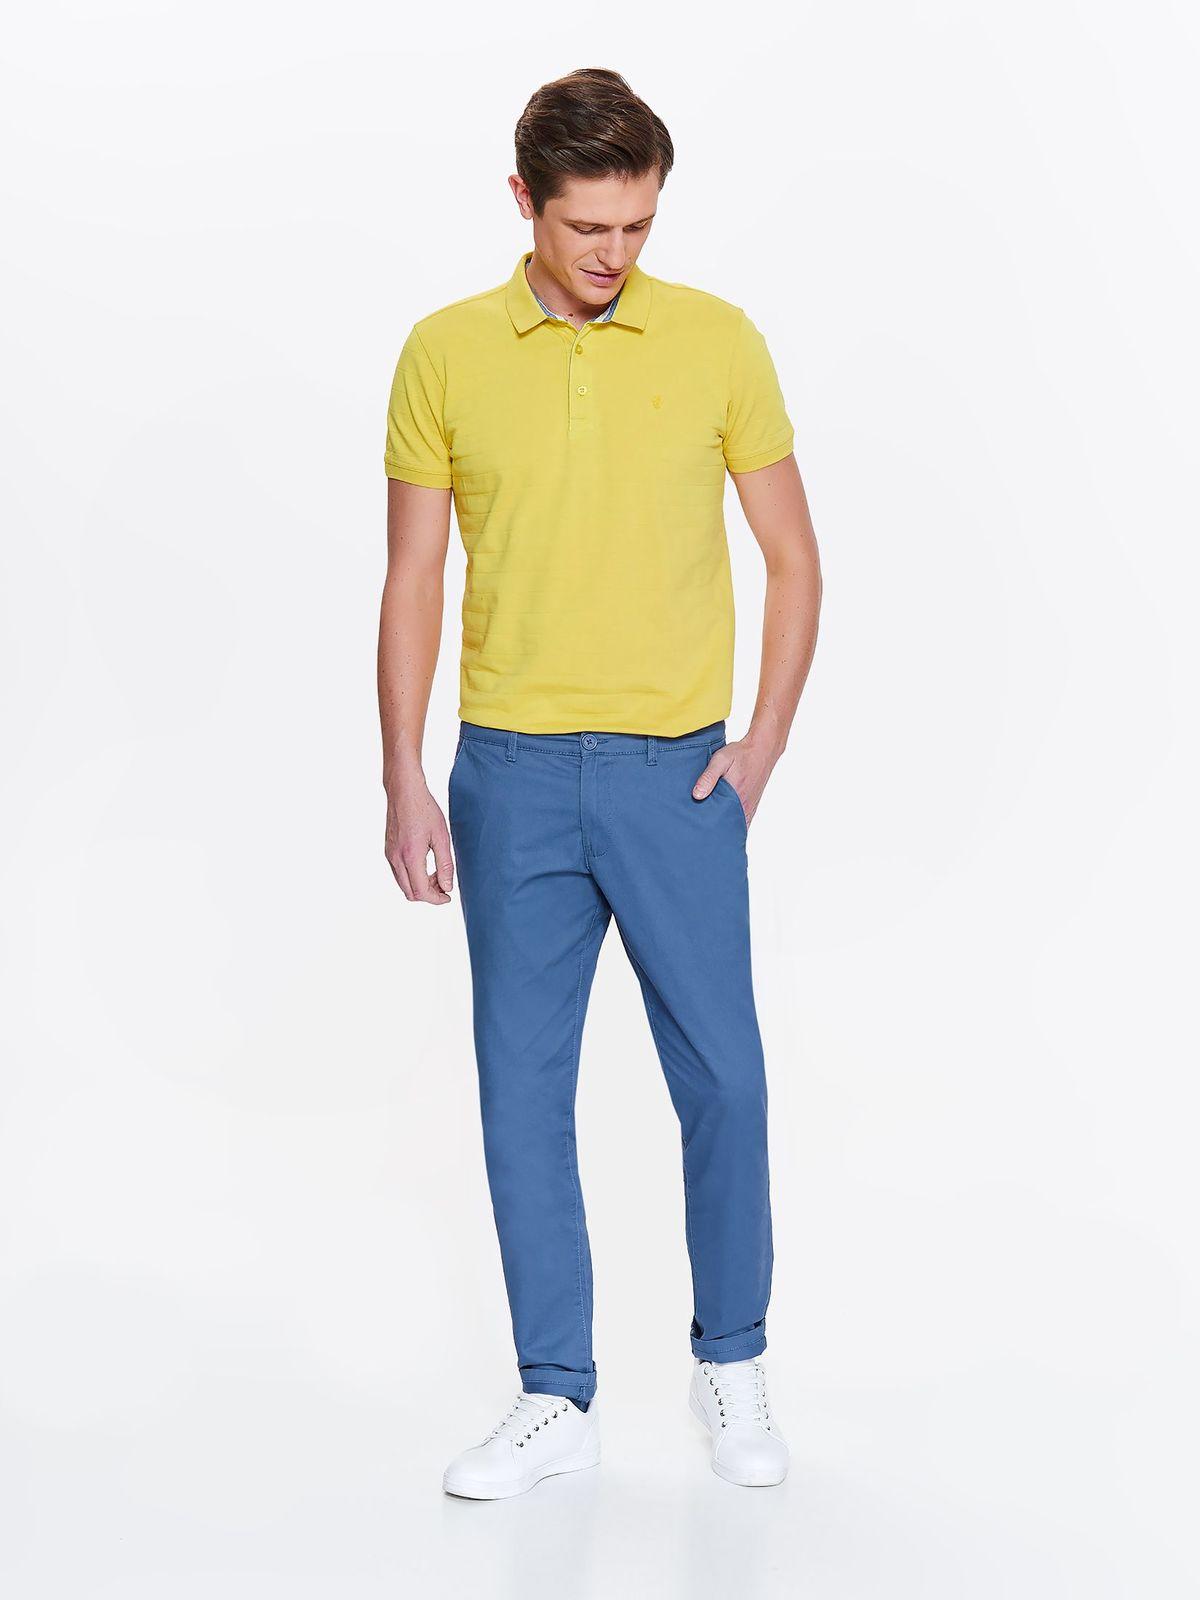 Брюки мужские Top Secret, цвет: синий. SSP2774NI. Размер 31 (46/48)SSP2774NI